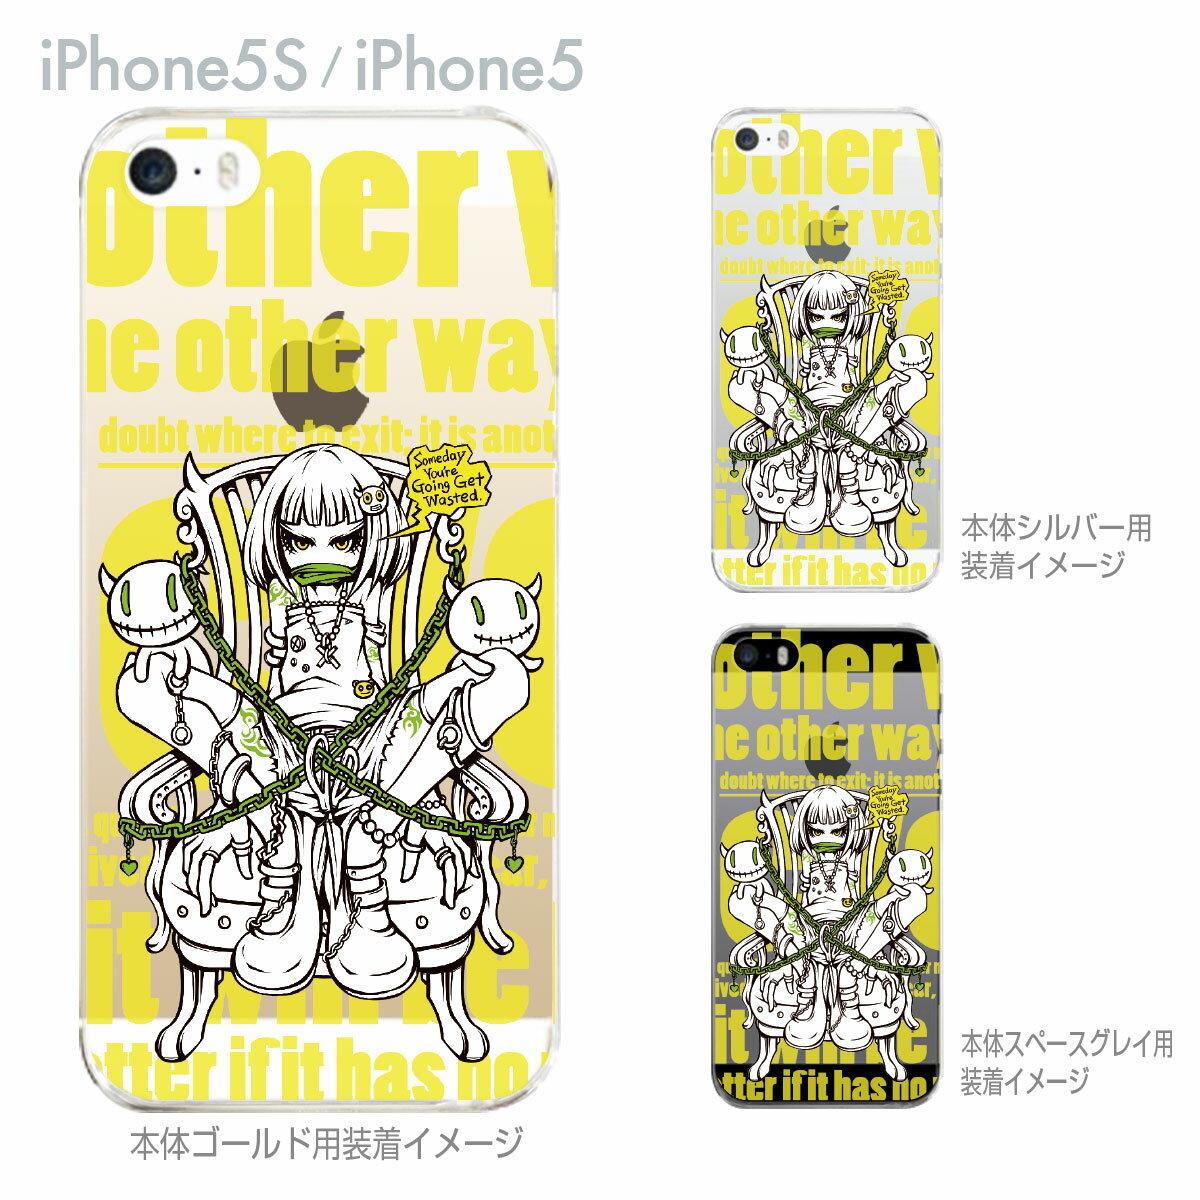 iPhone5s iPhone5 iPhone SE Clear Arts iPhone ケース カバー スマホケース クリアケース ハードケース【Project.C.K.】【プロジェクトシーケー】【HELP】 11-ip5s-ck0016s